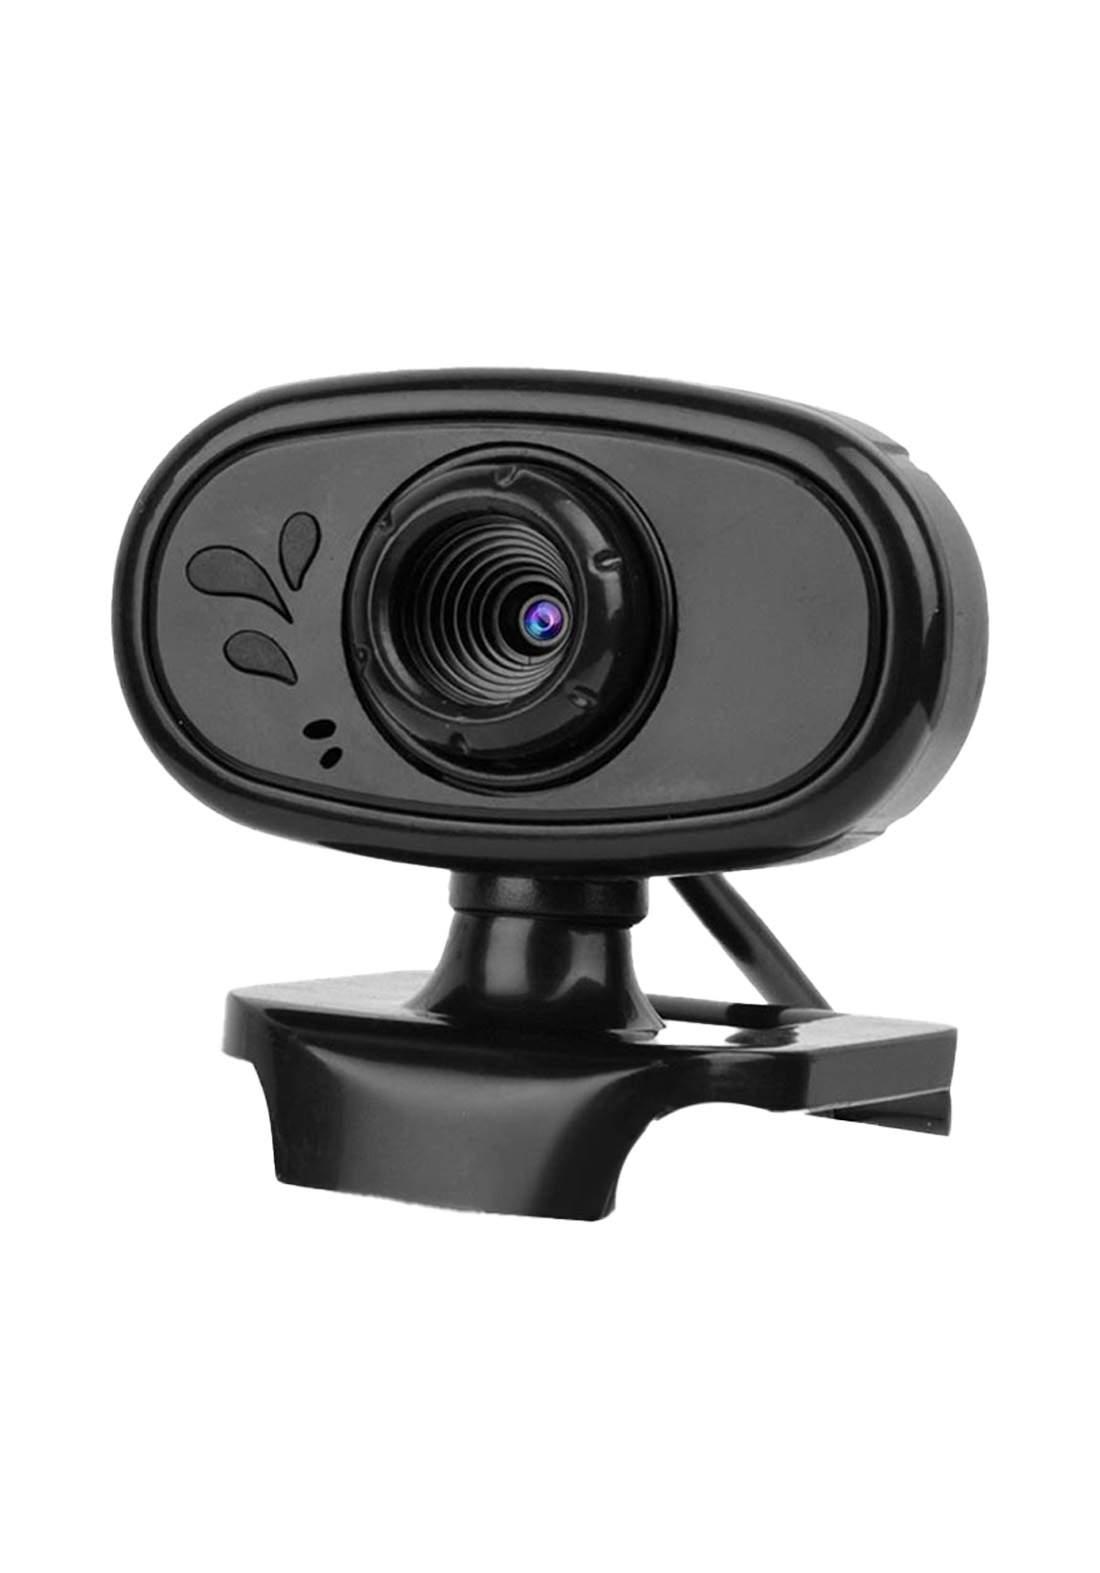 Xtrike ME XPC01 Web Camera USB 480p 30fps  - Black